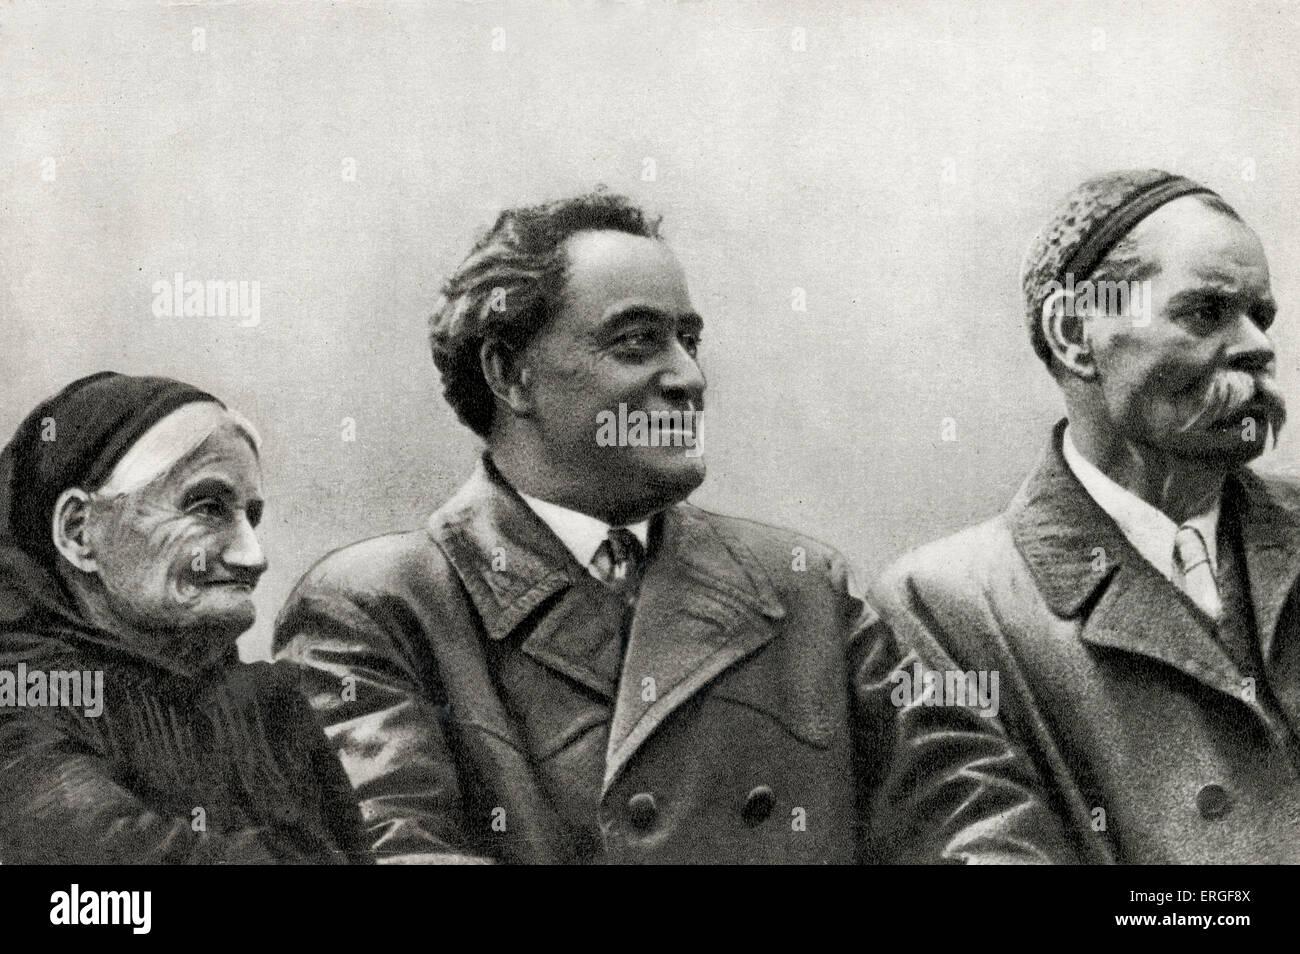 e513d05f53d7 Maxim Gorky with Georgi Dimitrov and Paraskeva Dimitrova (mother of Dimitrov)  in 18 October 1934. Dimitrov was charged with